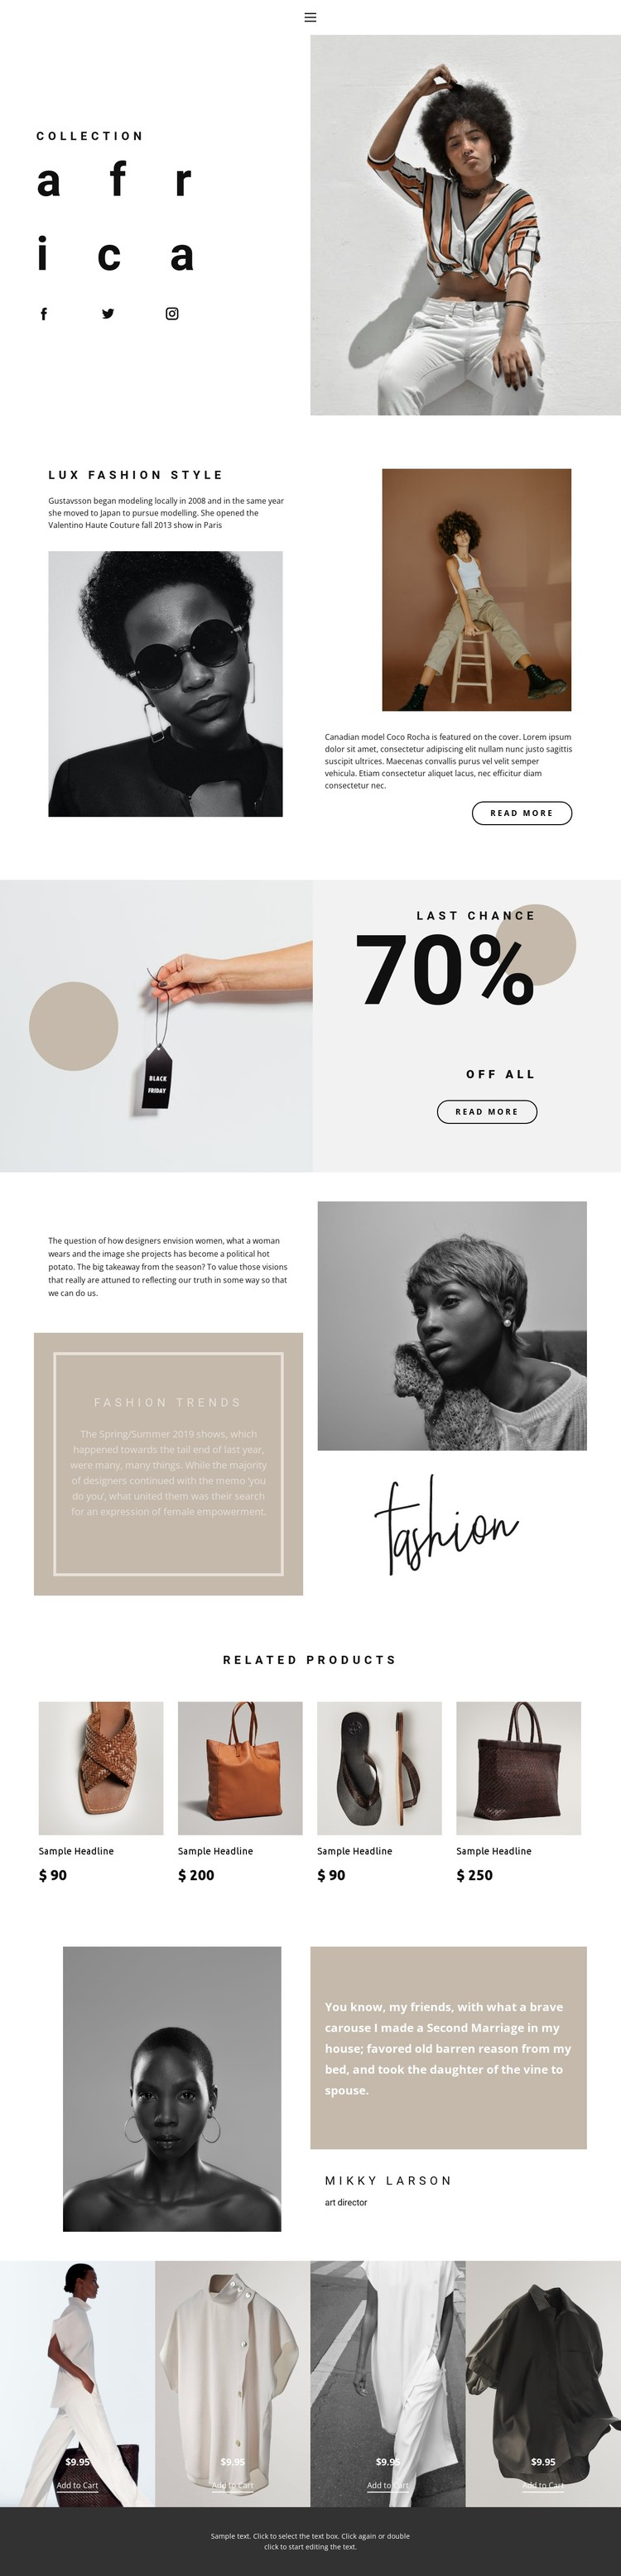 Fashion ideas and advance Static Site Generator